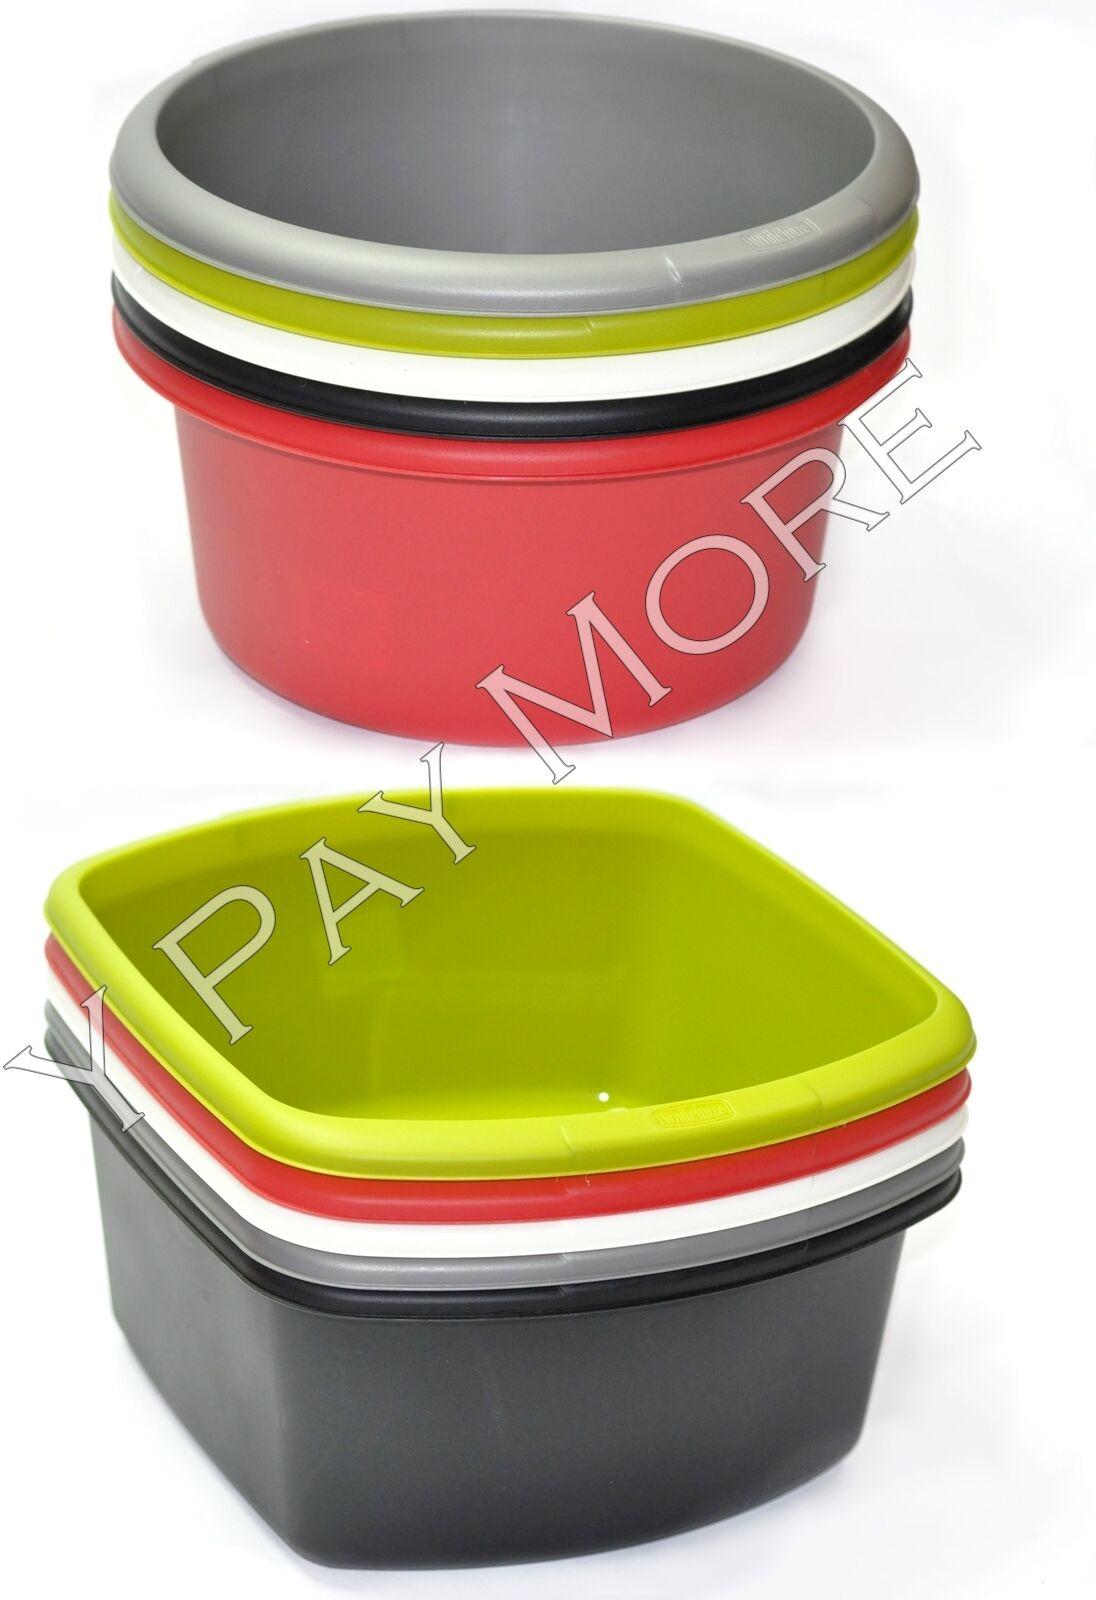 plastic circular rectangular baking mixing salad washing. Black Bedroom Furniture Sets. Home Design Ideas